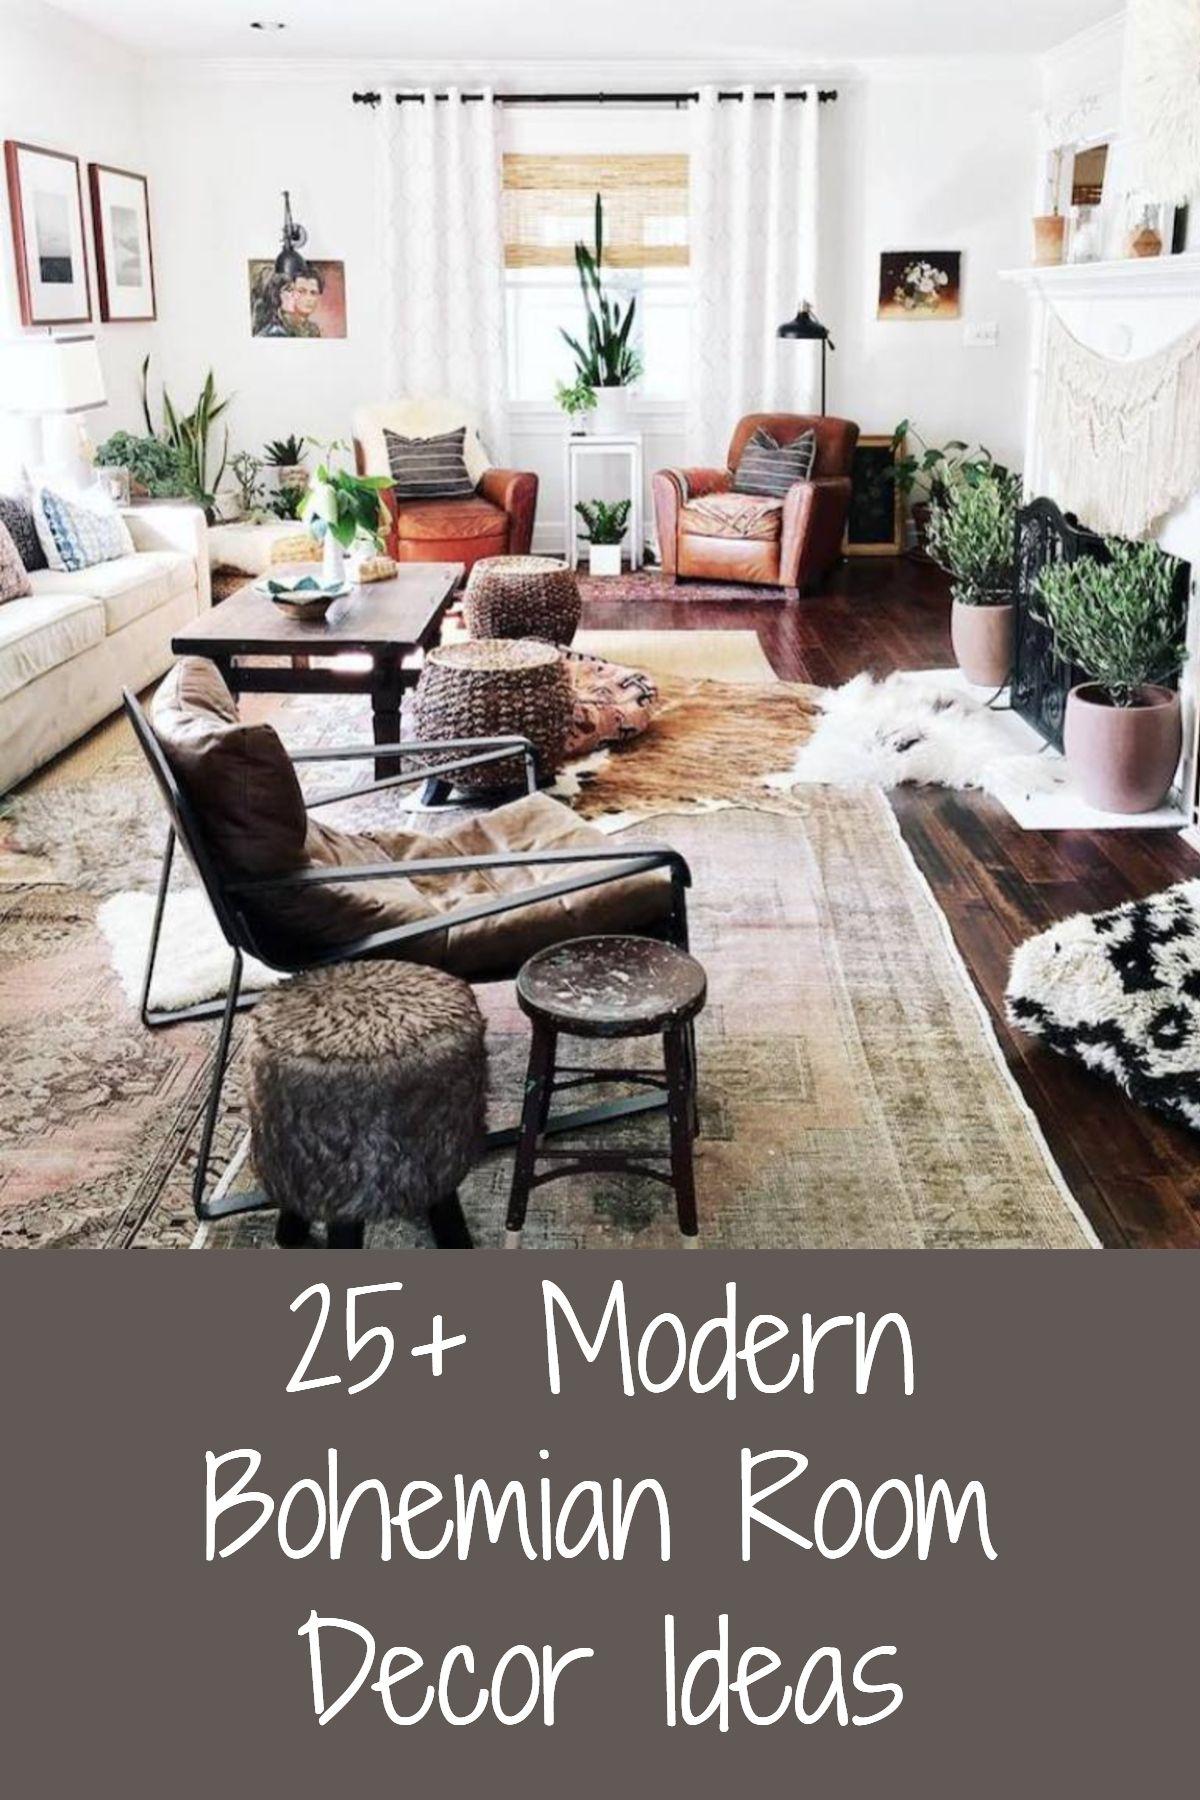 51 Bohemian Chic Decor Ideas Bohemian Living Room Decor Bohemian Room Decor Chic Living Room Decor